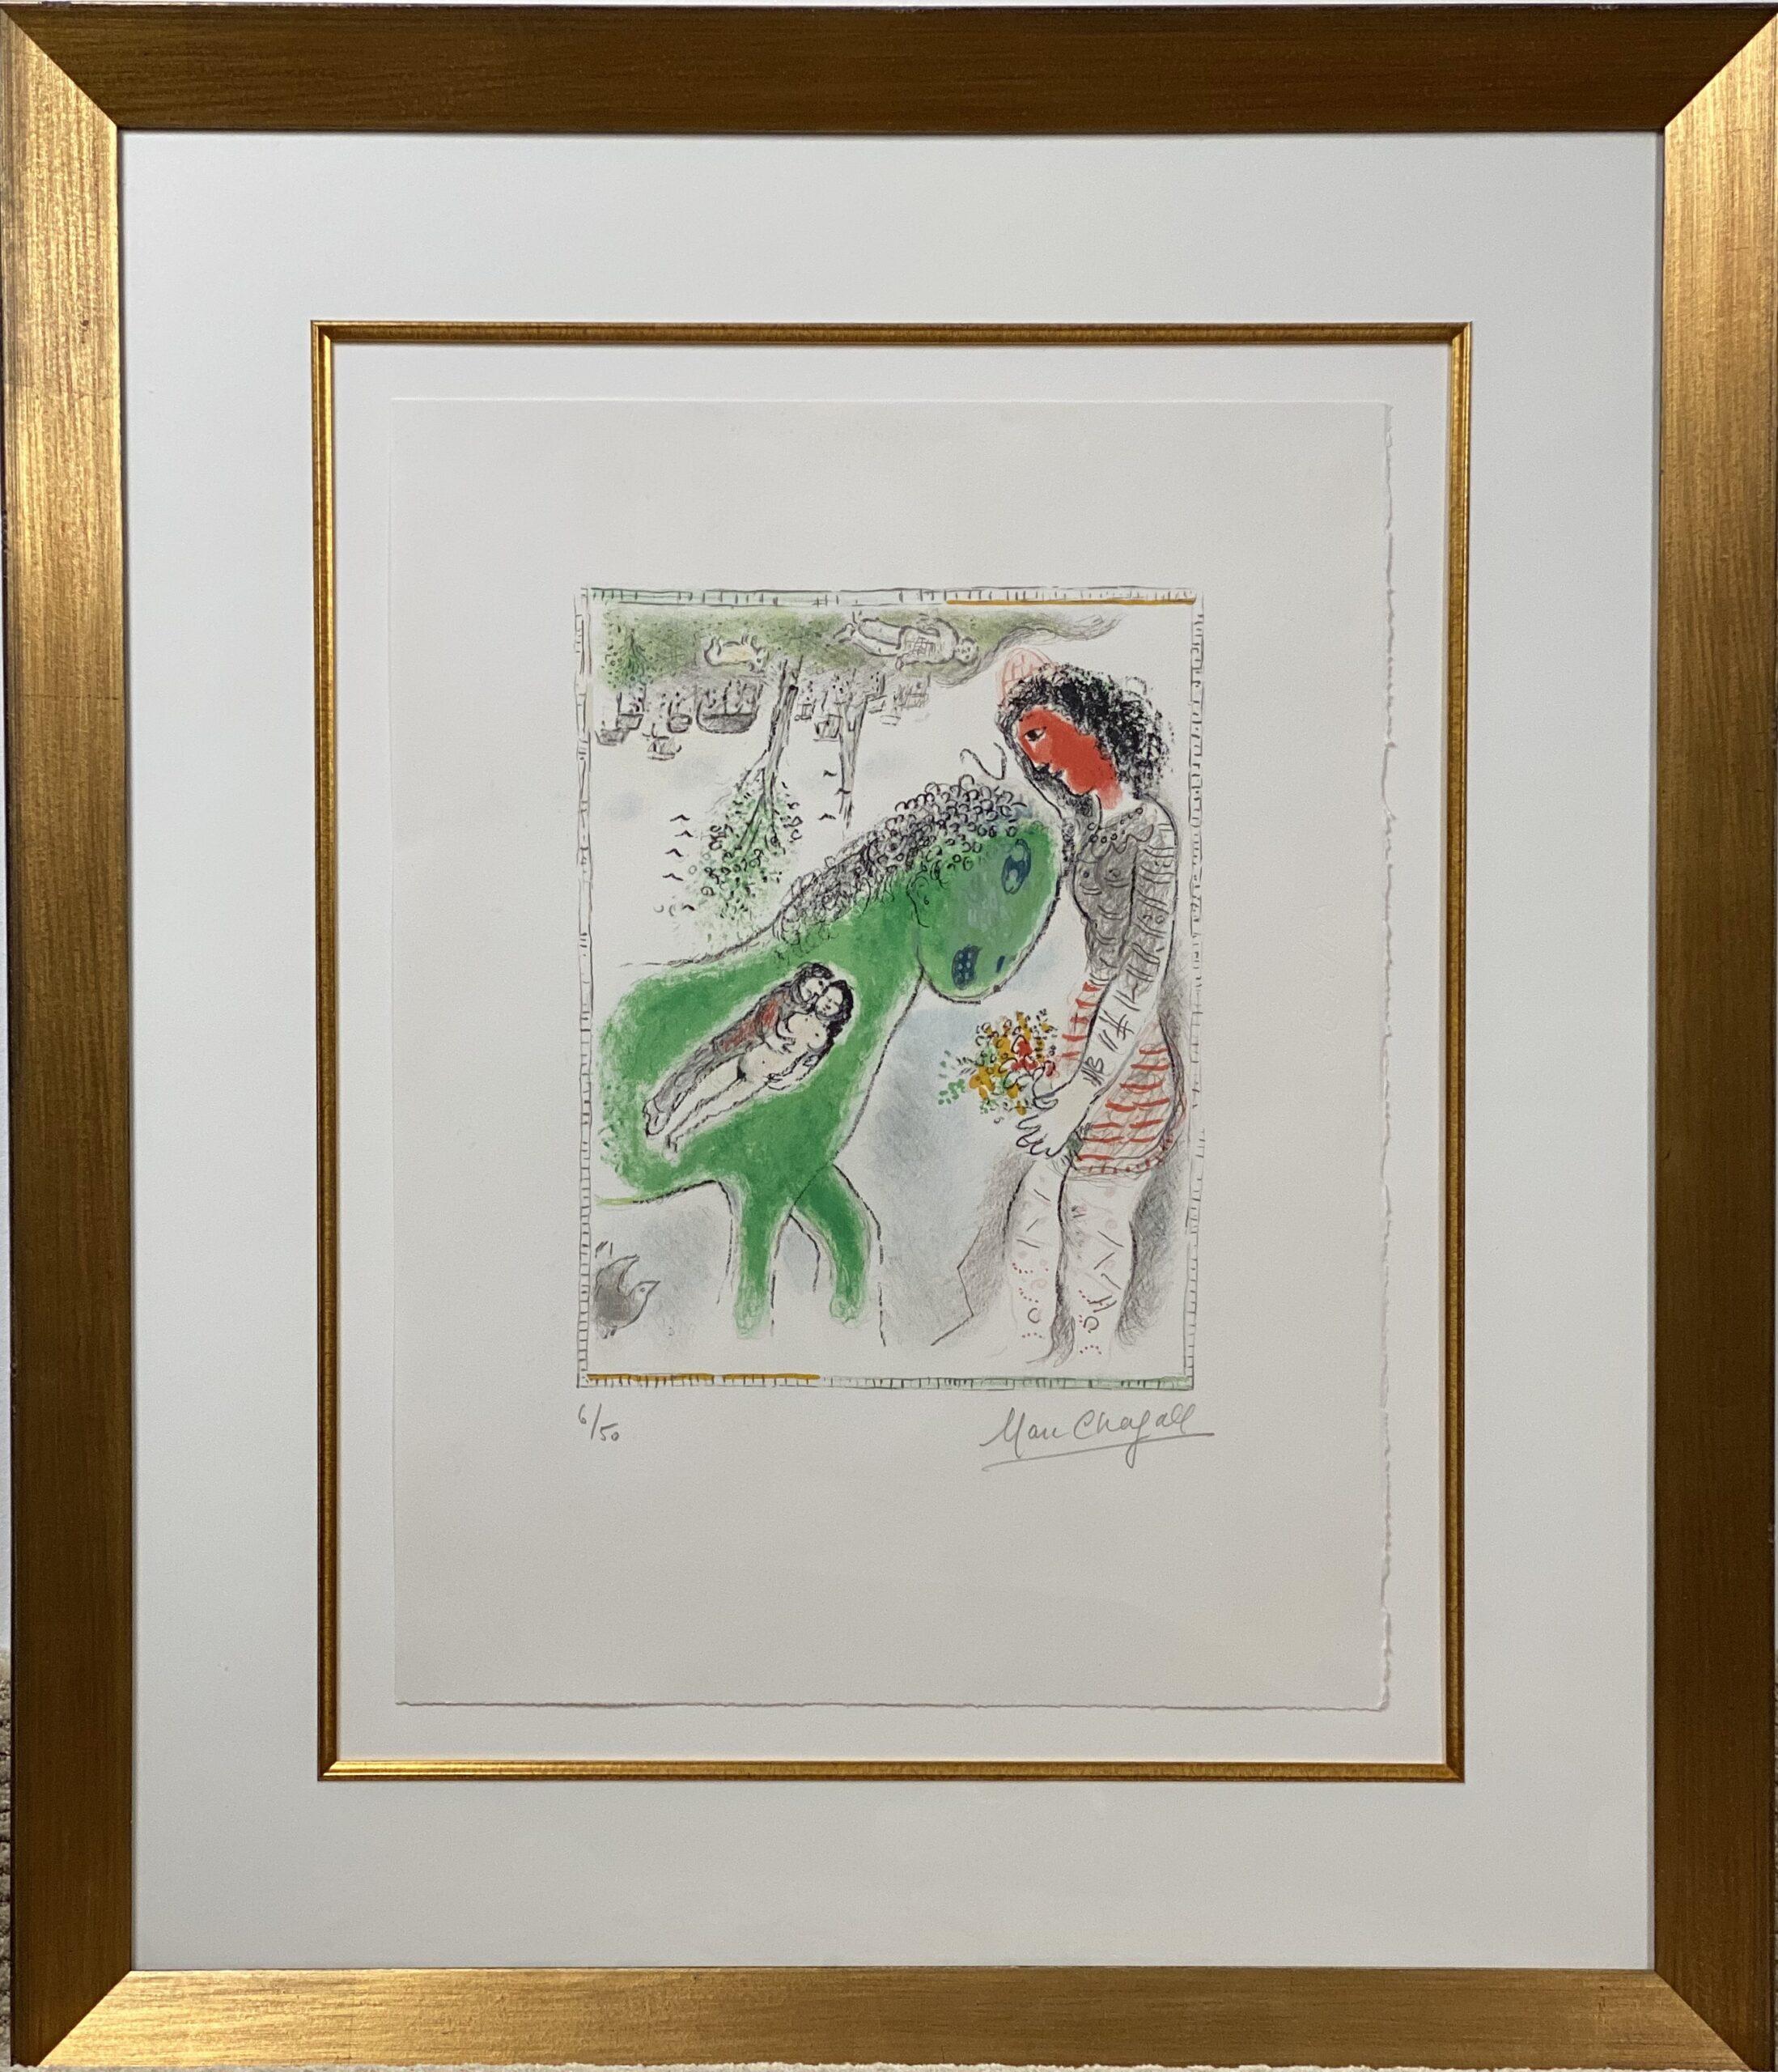 Chagall: Green Horse 2201